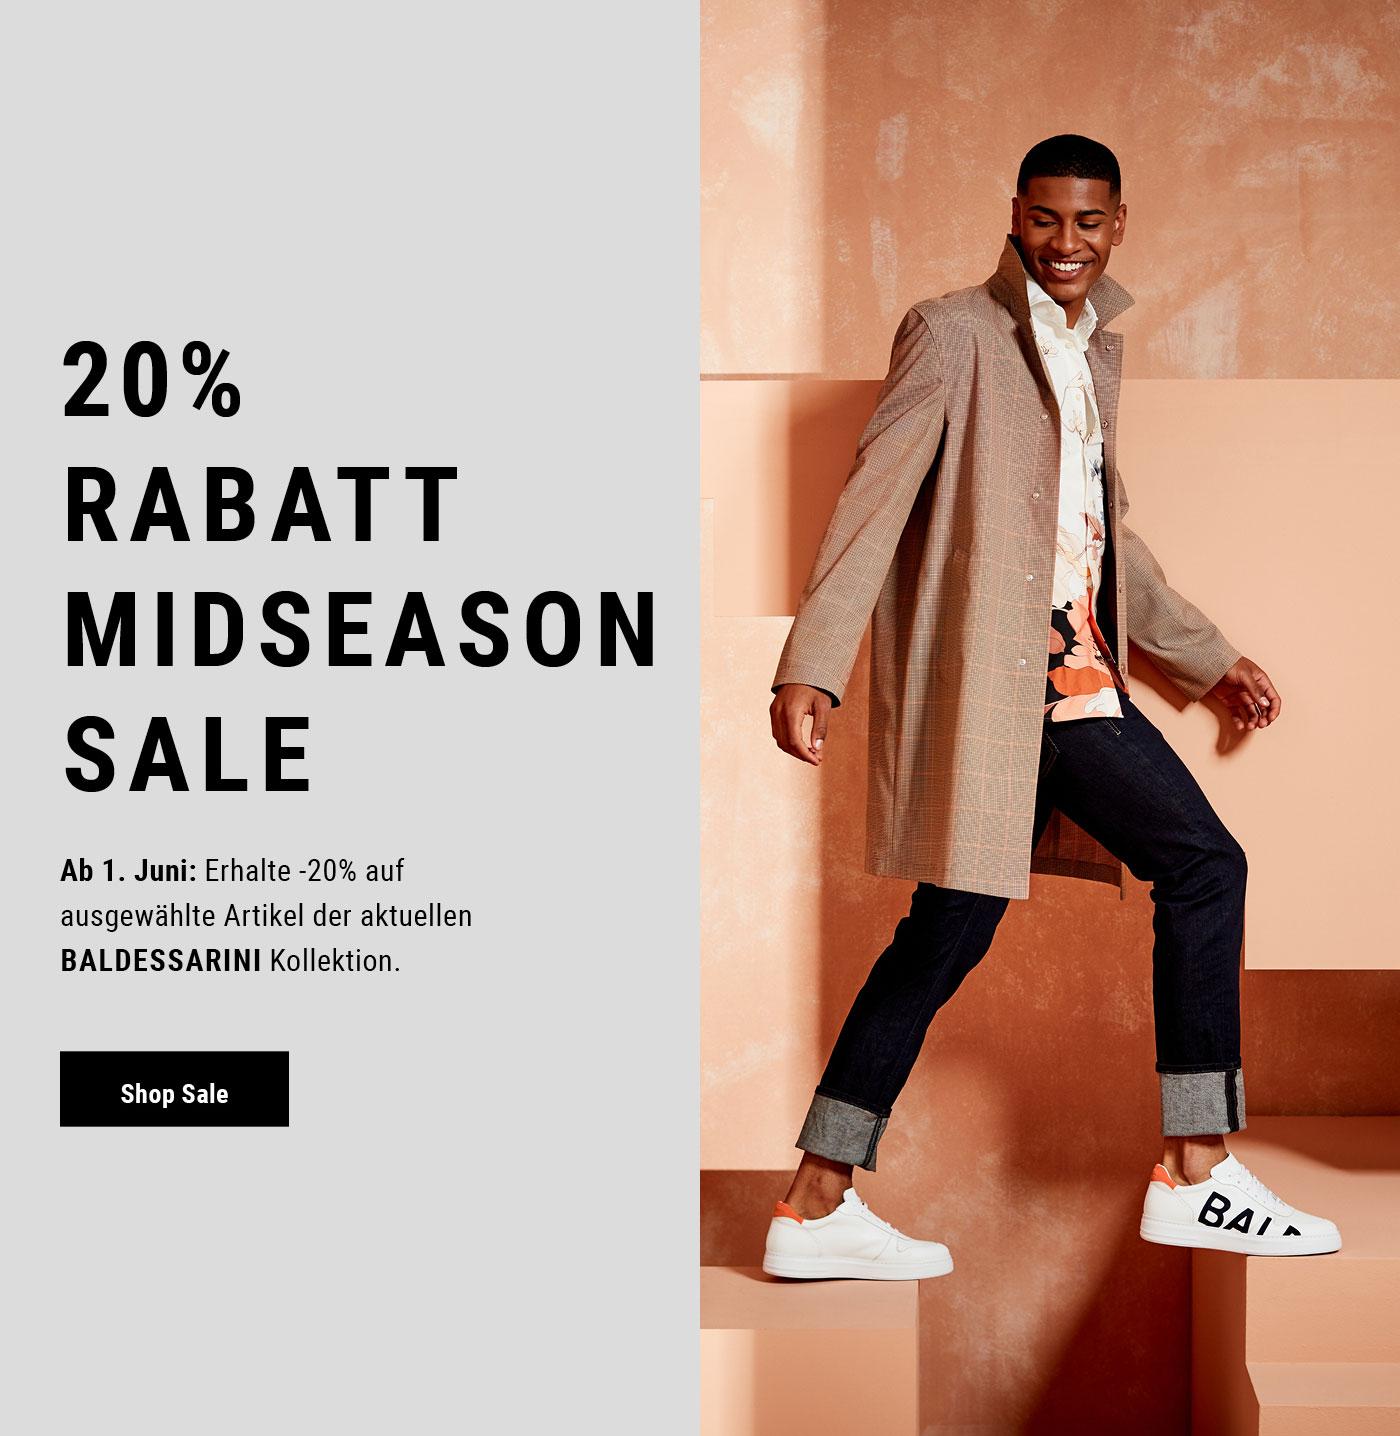 Midseason-Sale bei Baldessarini